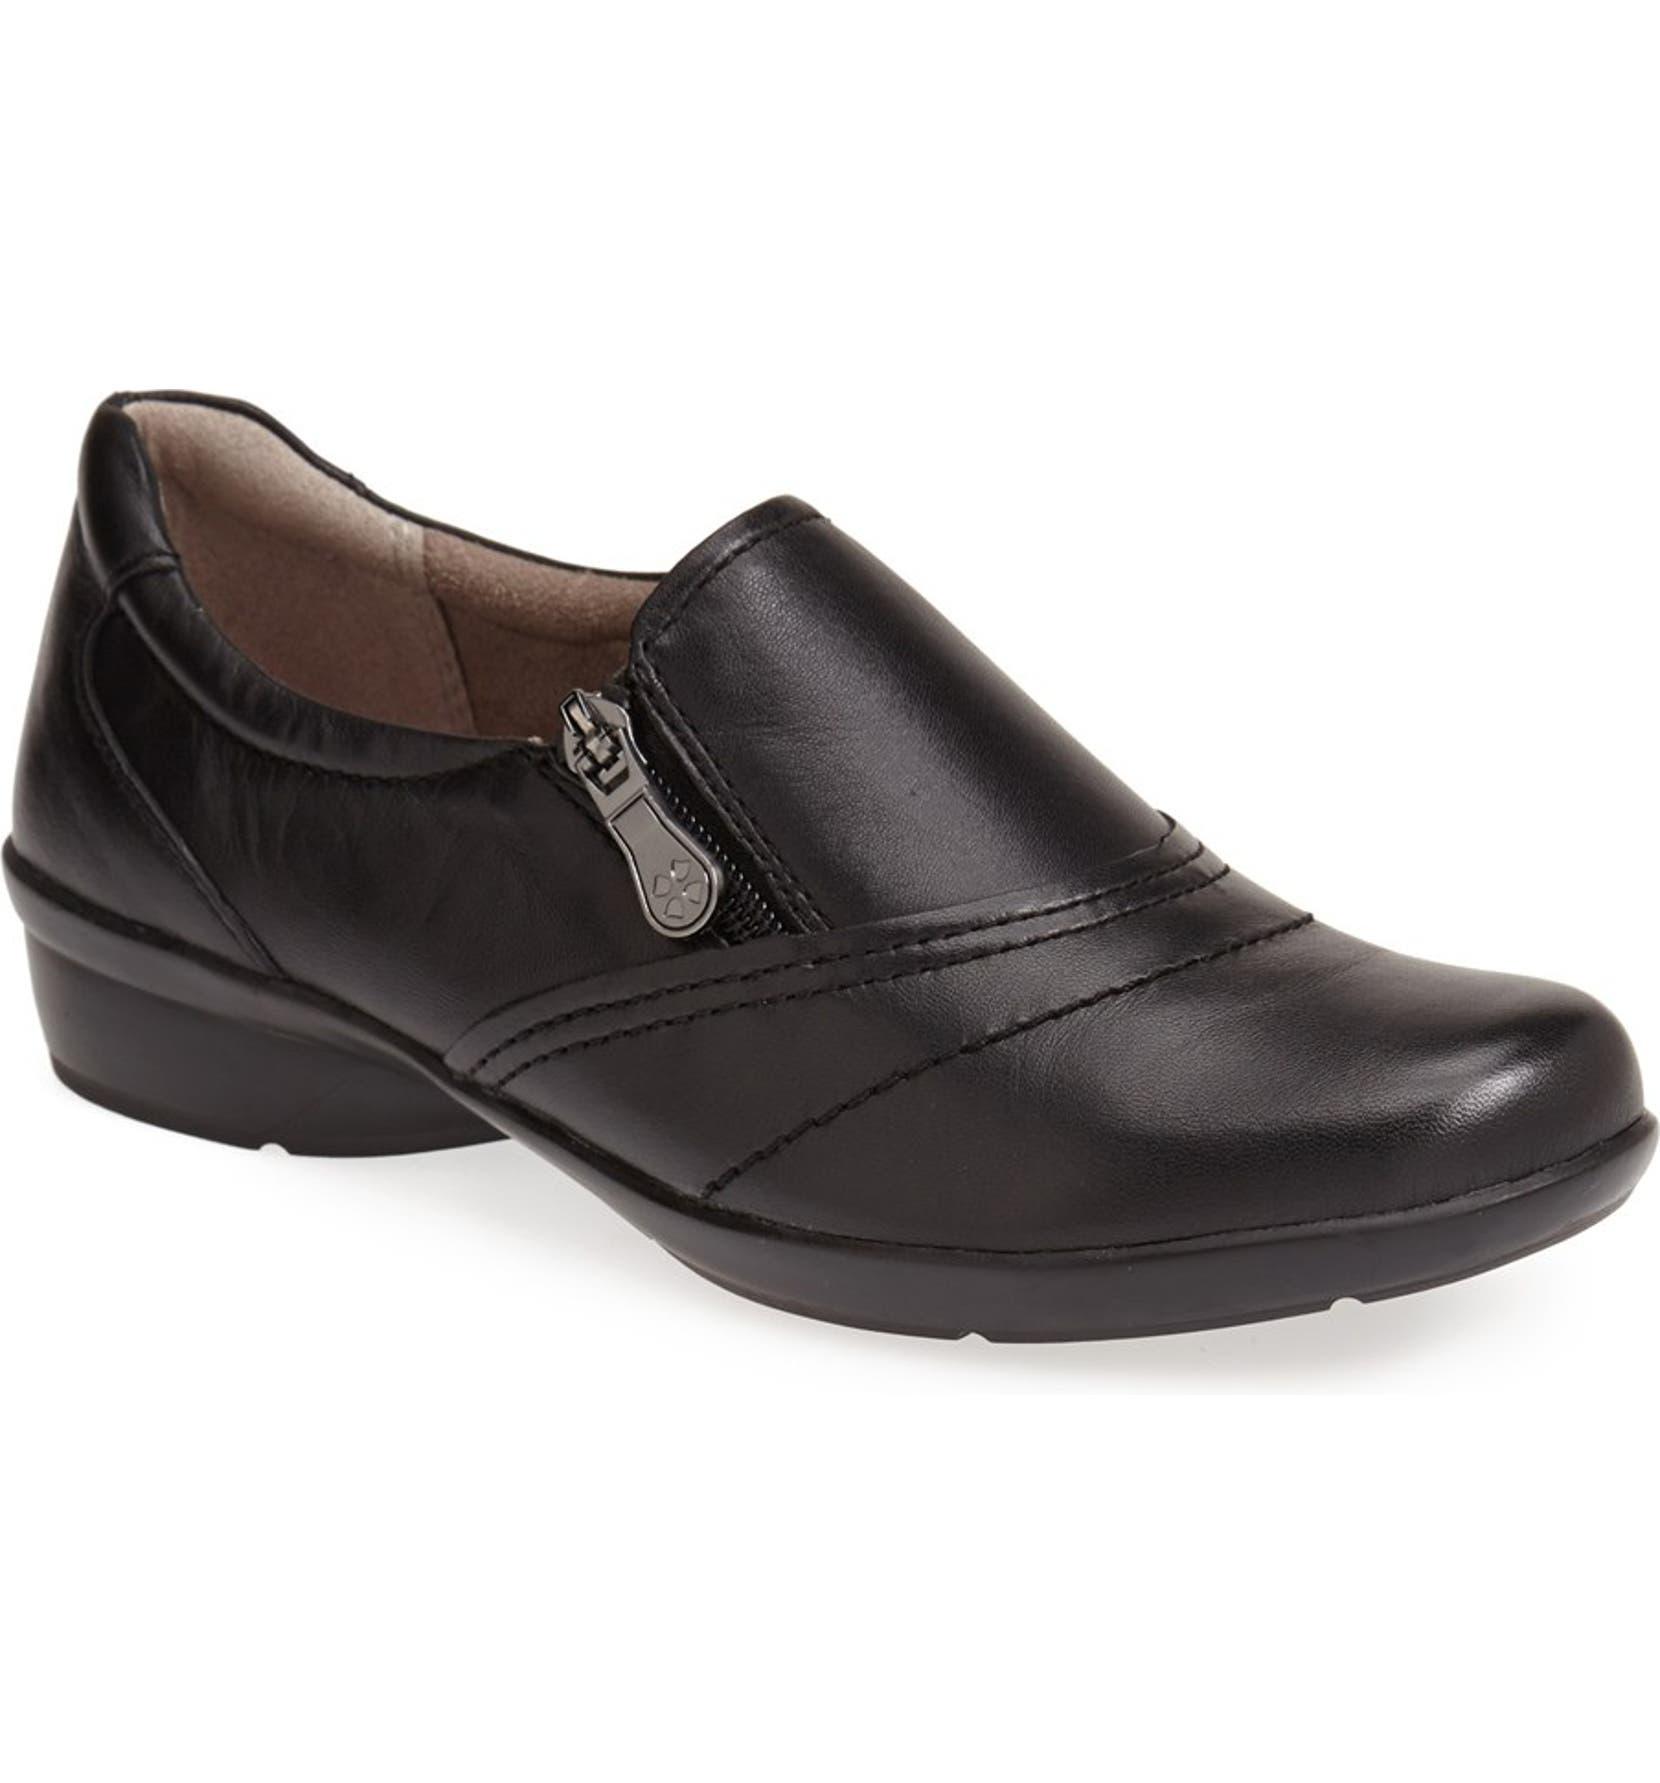 602930a4454 'Clarissa' Leather Flat